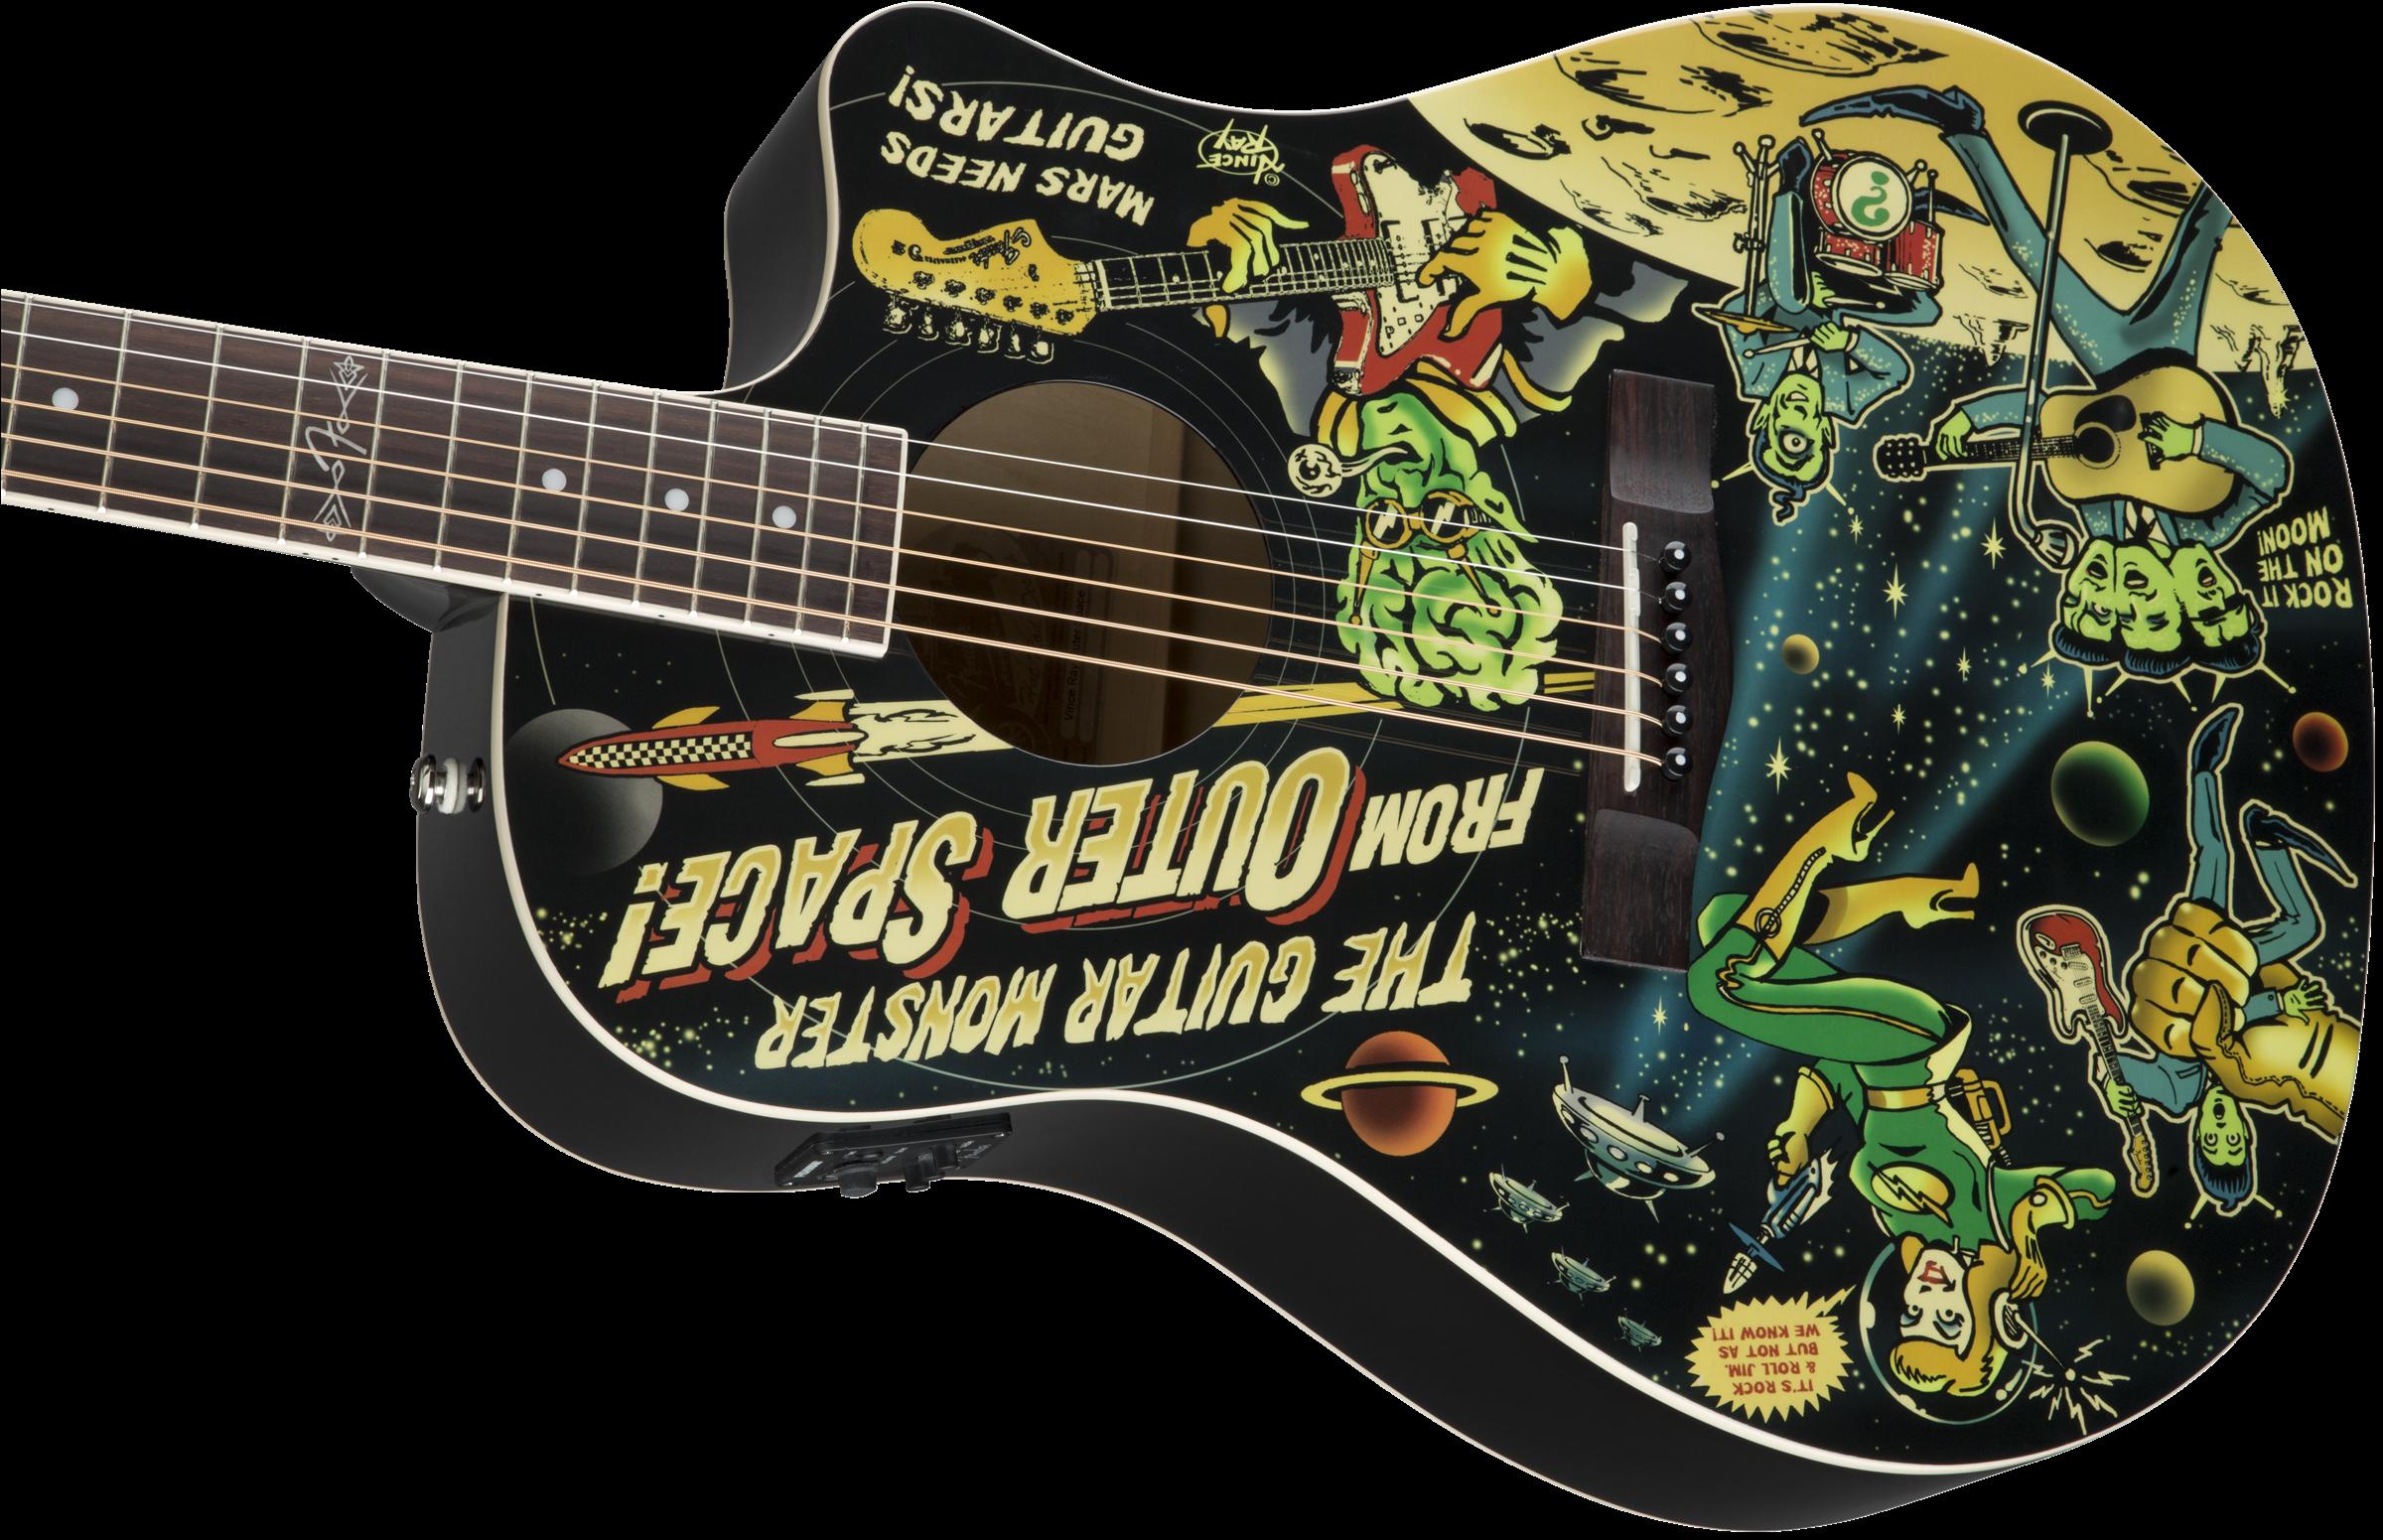 fender guitar united states: